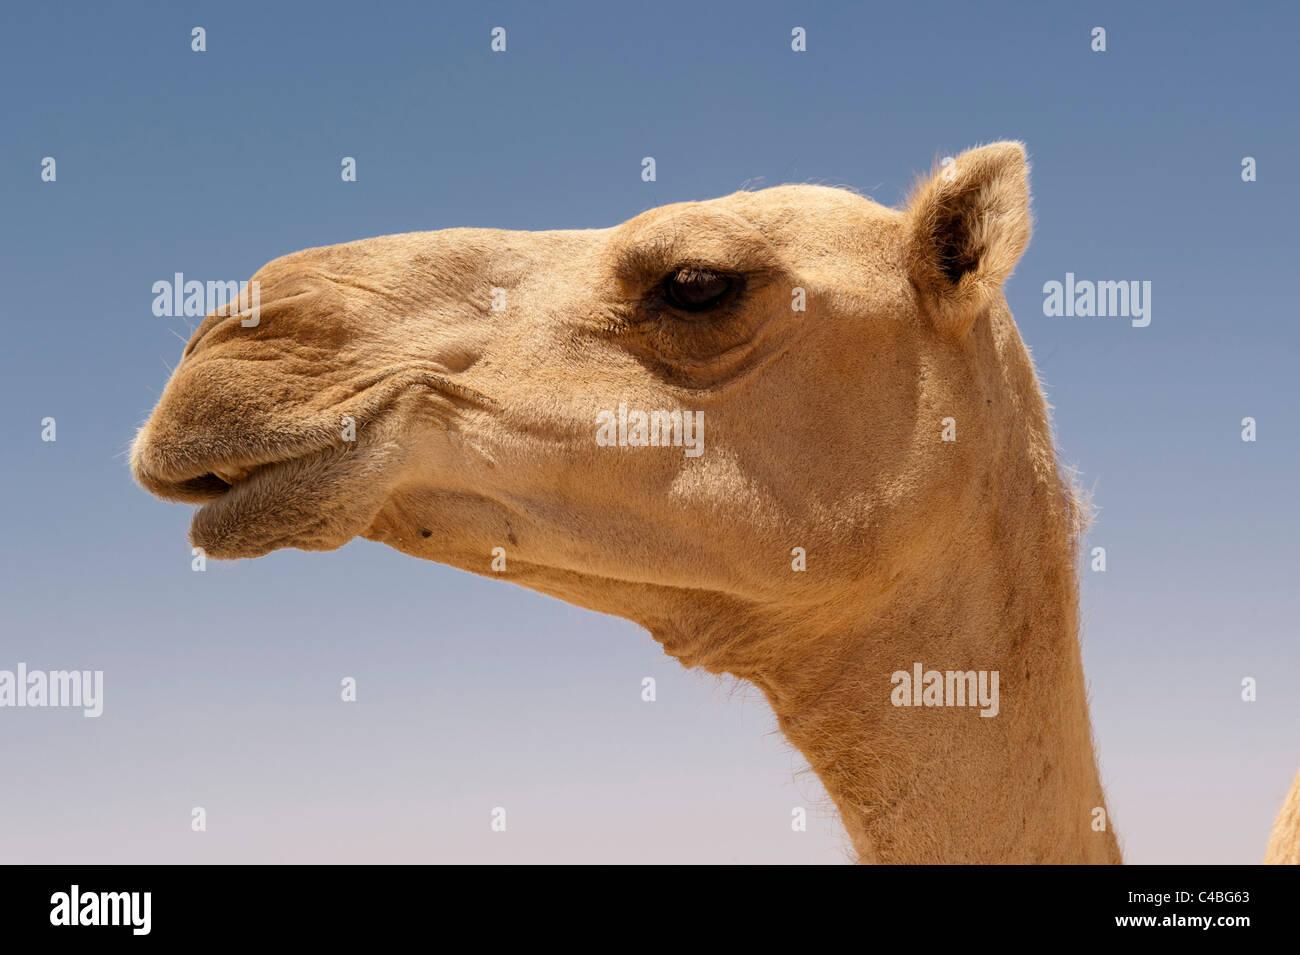 Camel, Somaliland, Somalia Stock Photo